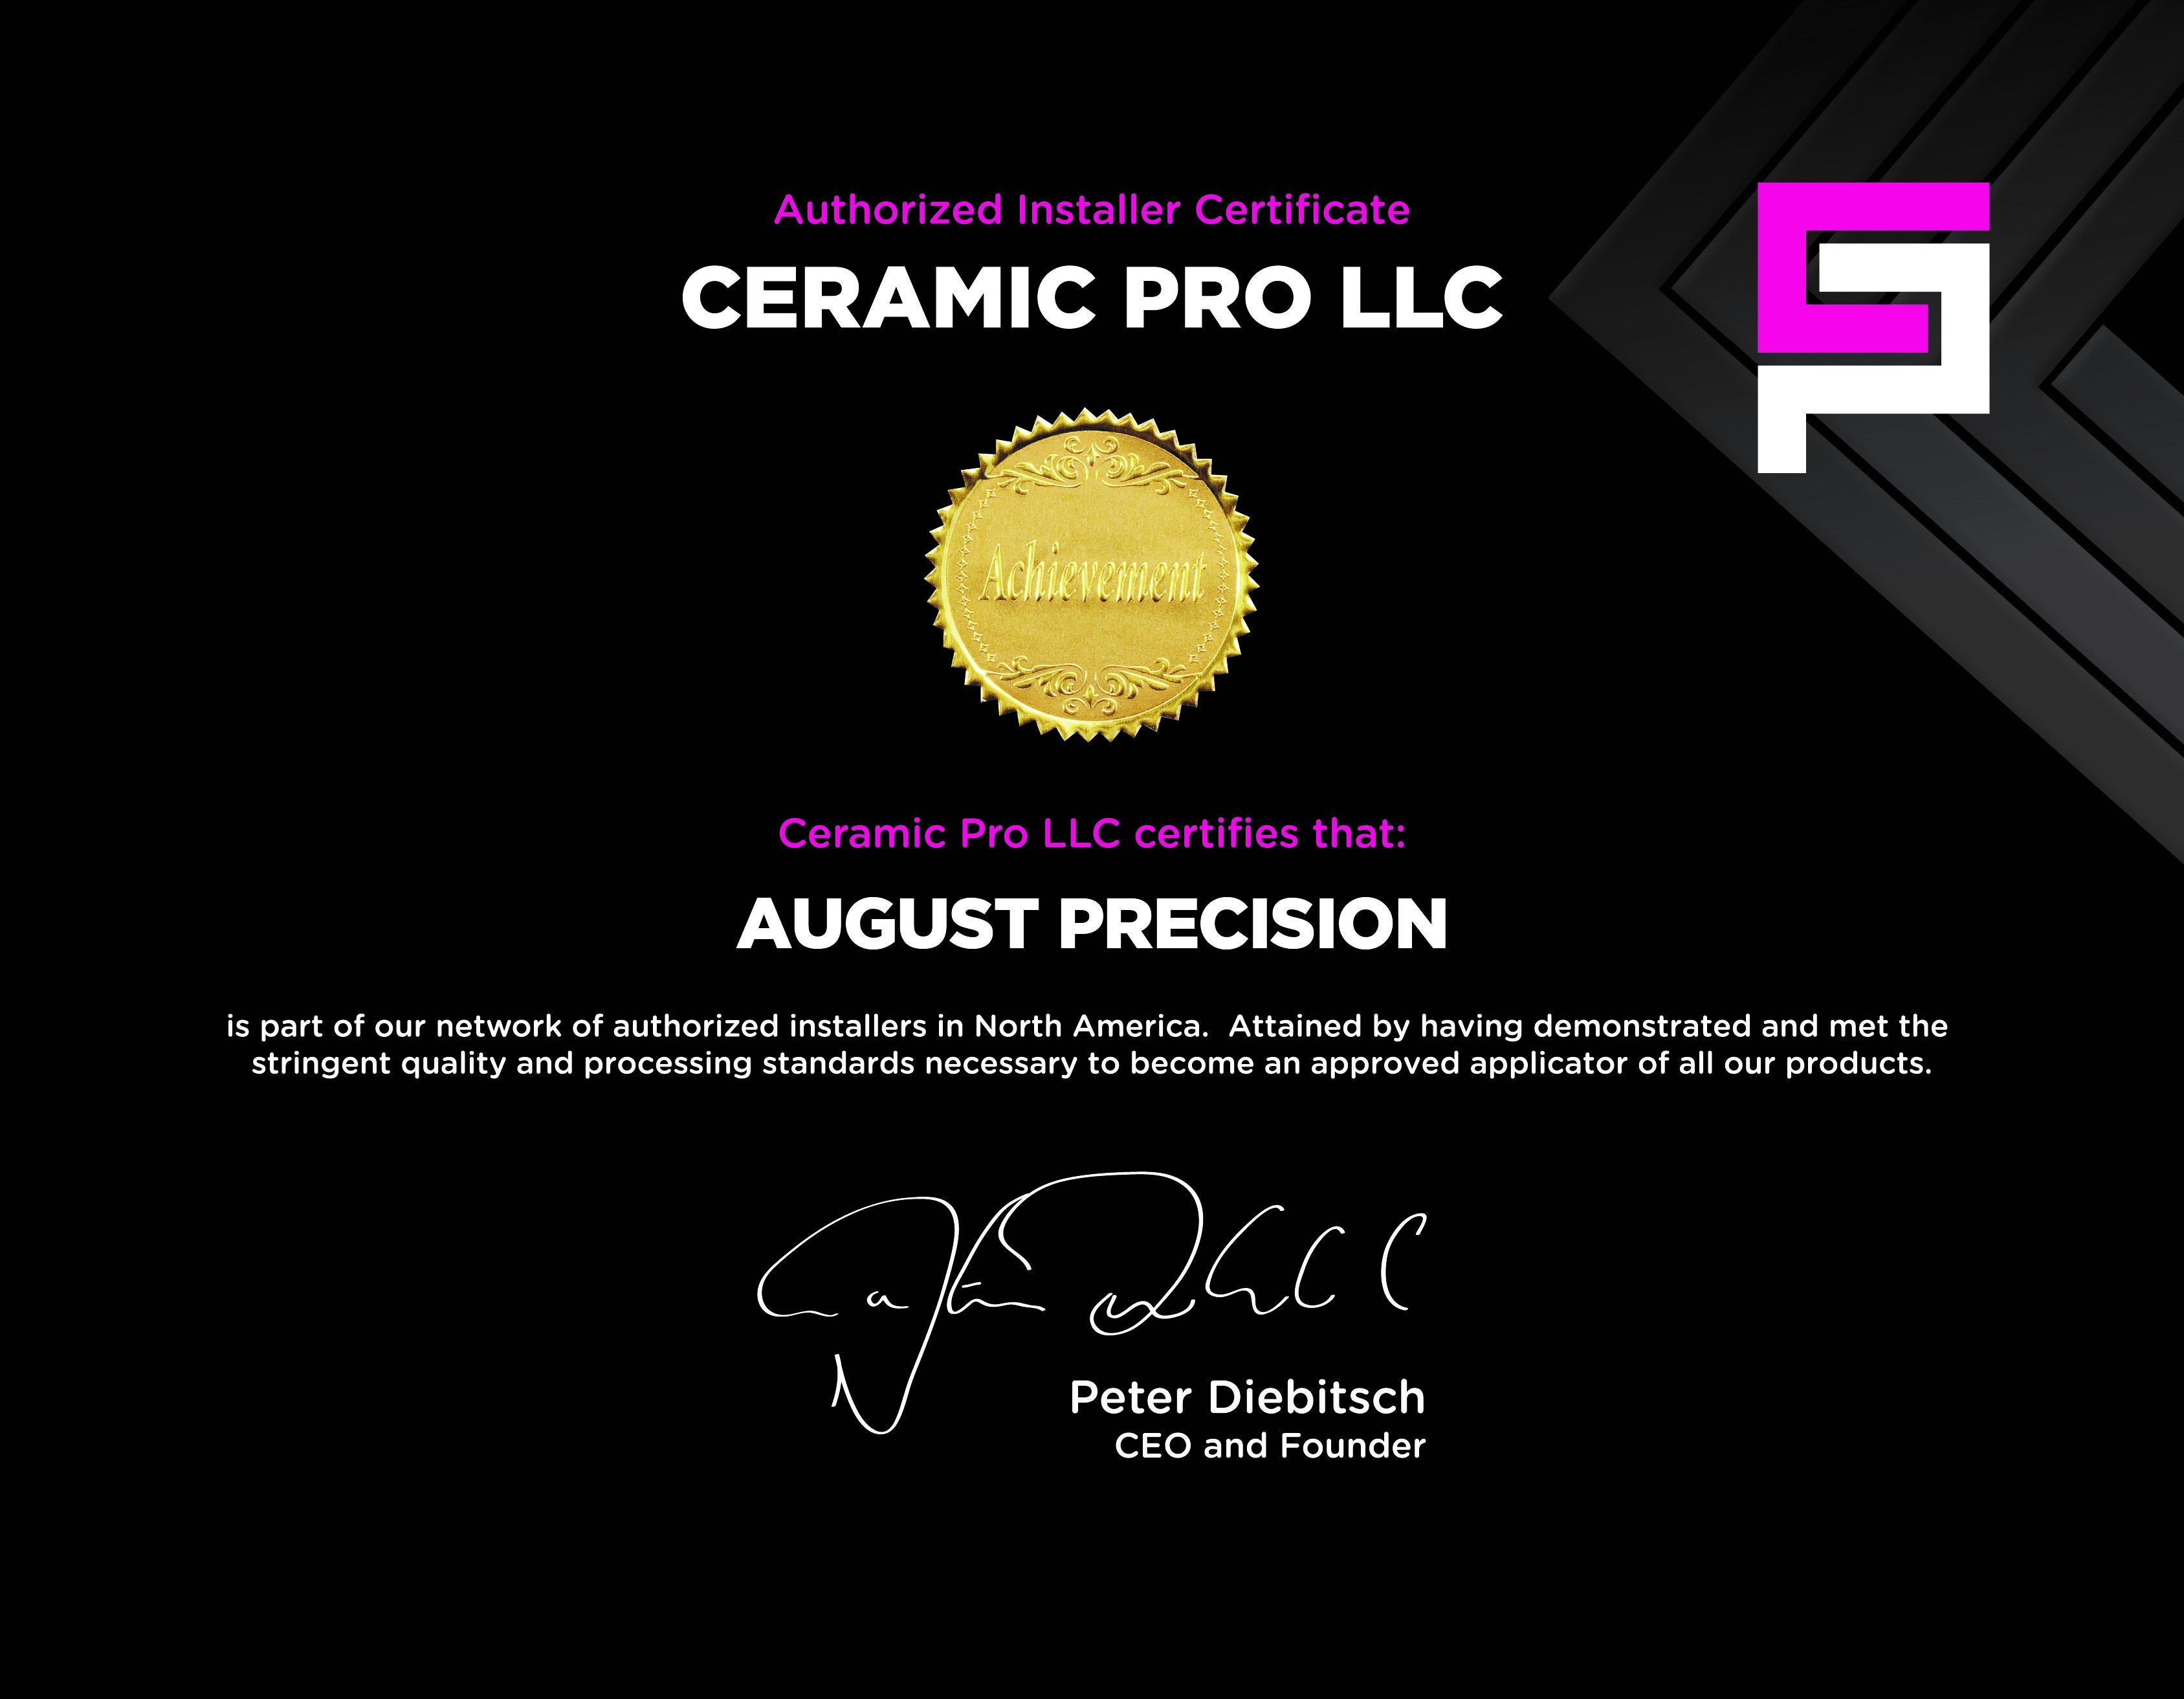 August Precision Ceramic Pro Certification Document Image